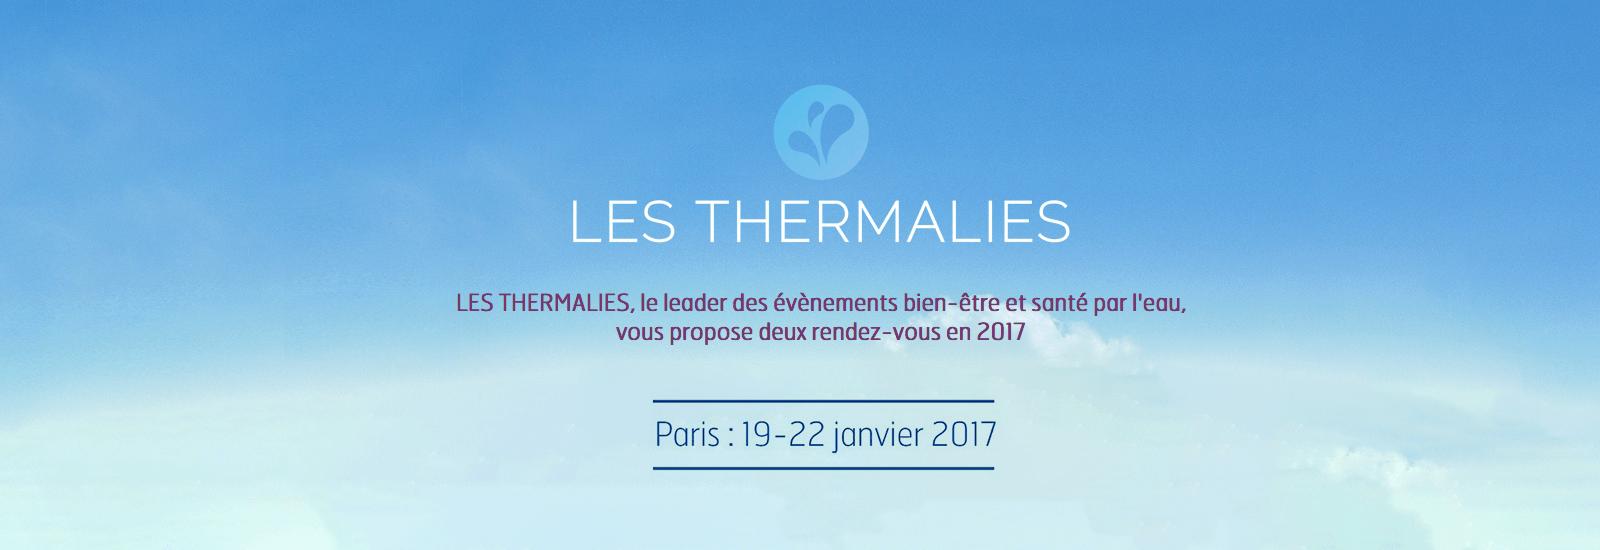 Thermalies Paris